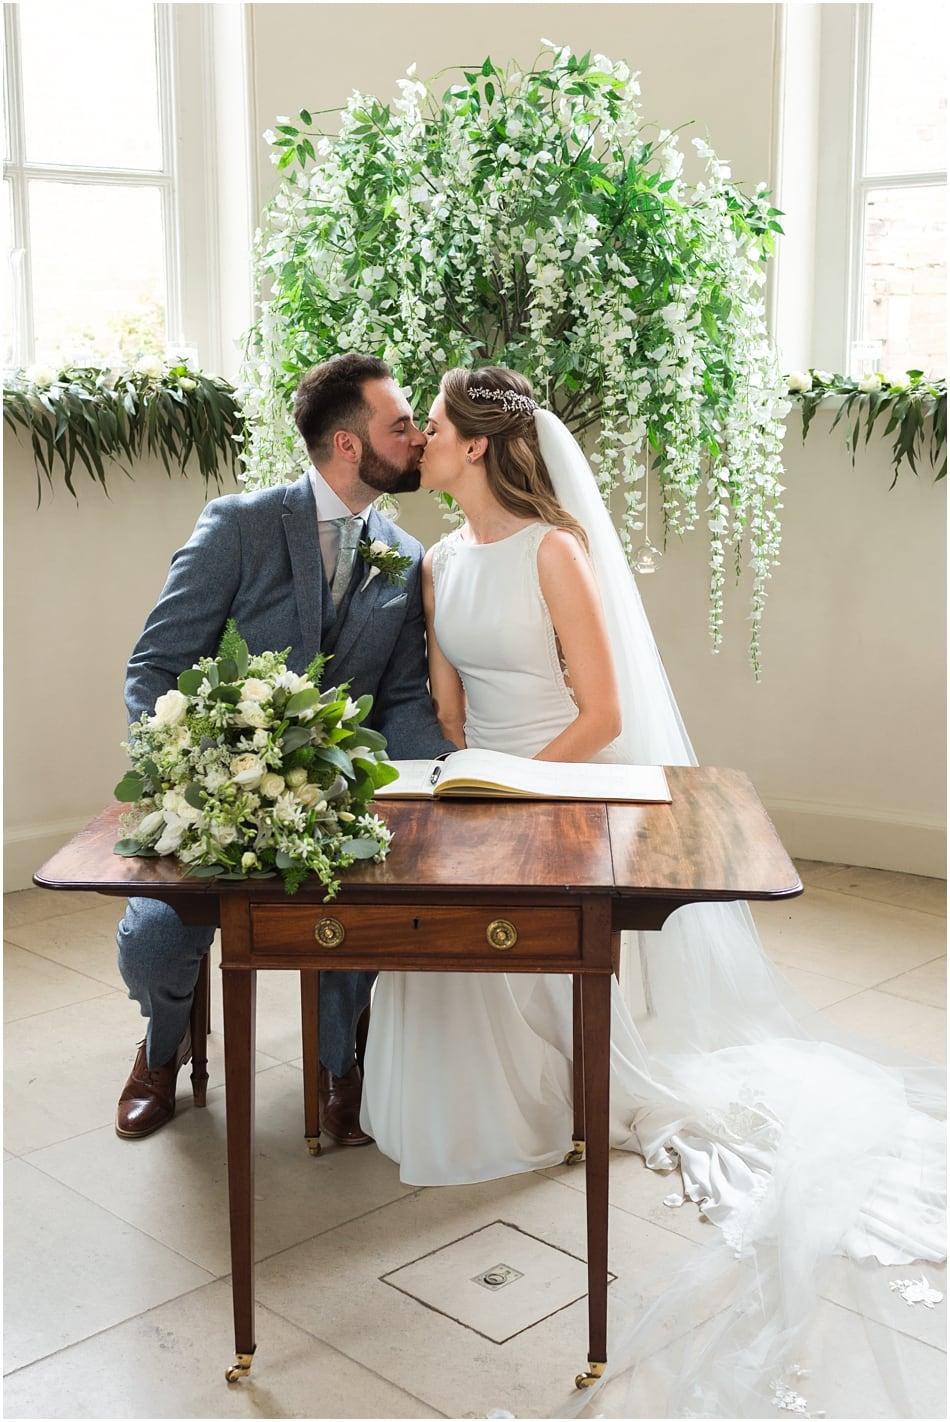 Iscoyd Park wedding photography| ceremony room